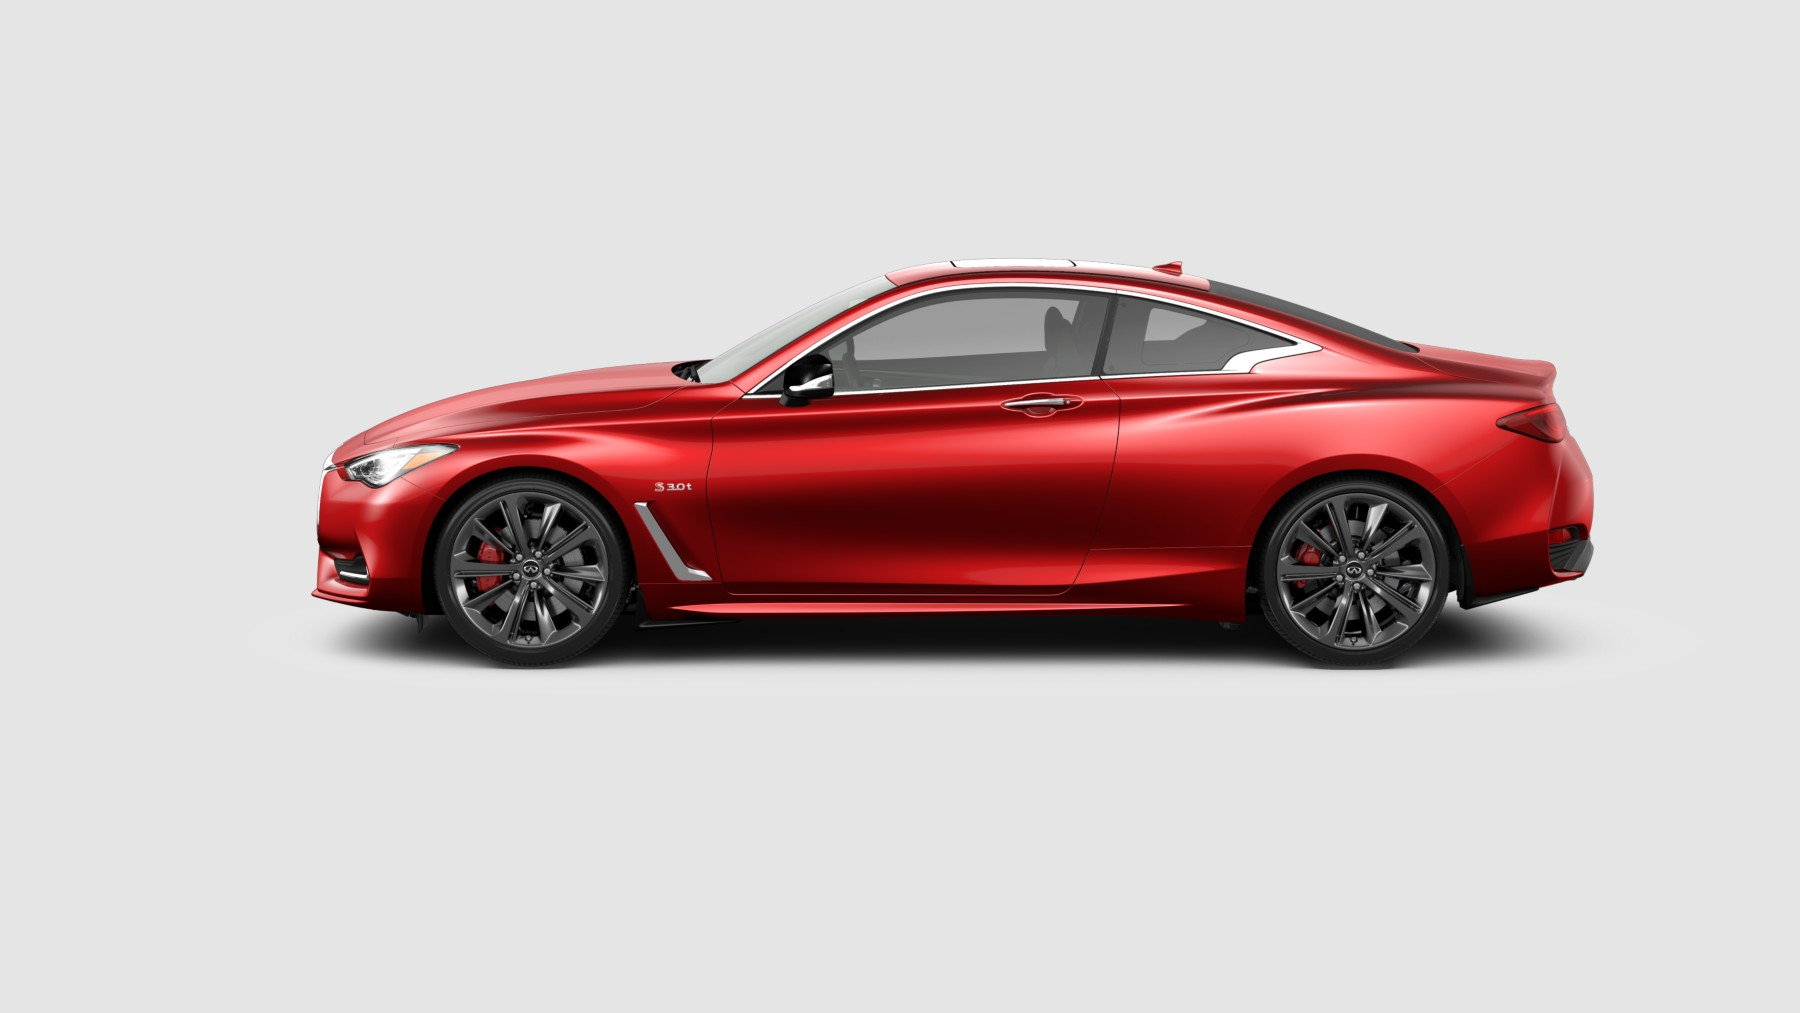 2019 Q60 RED SPORT 400 AWD